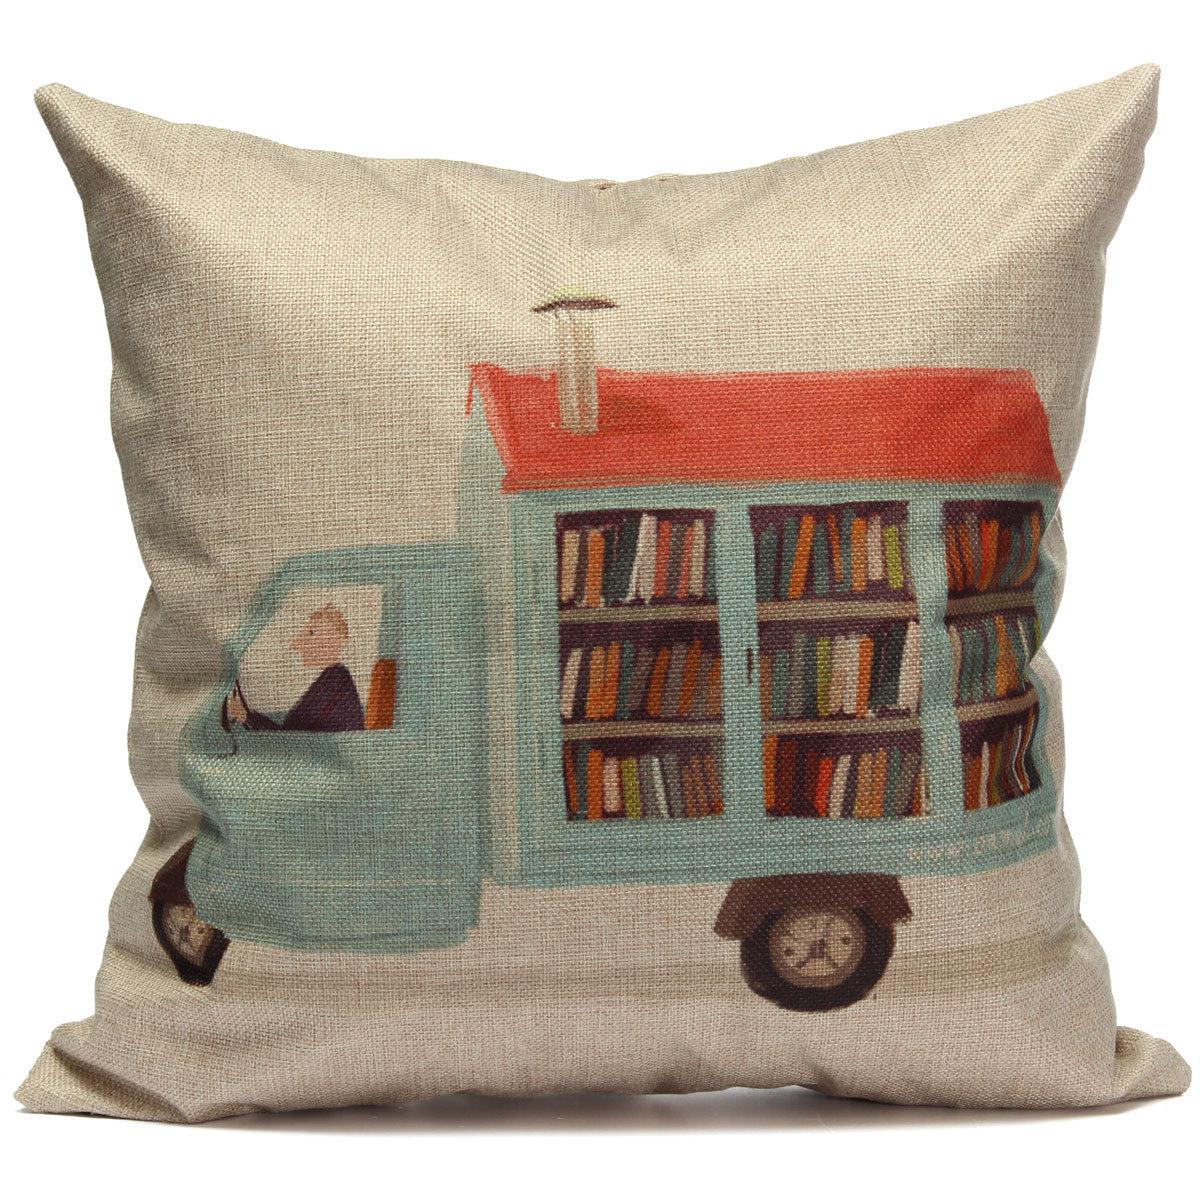 Vintage Square Linen Cotton Throw Pillow Case Cushion  : FB82161657E68B9226B923C6835633C6C6D2B6739D2683D22613CAF023D29303CFC8D29BEB7336039926C95683519A16C8F5C7 from www.ebay.com size 1200 x 1200 jpeg 389kB